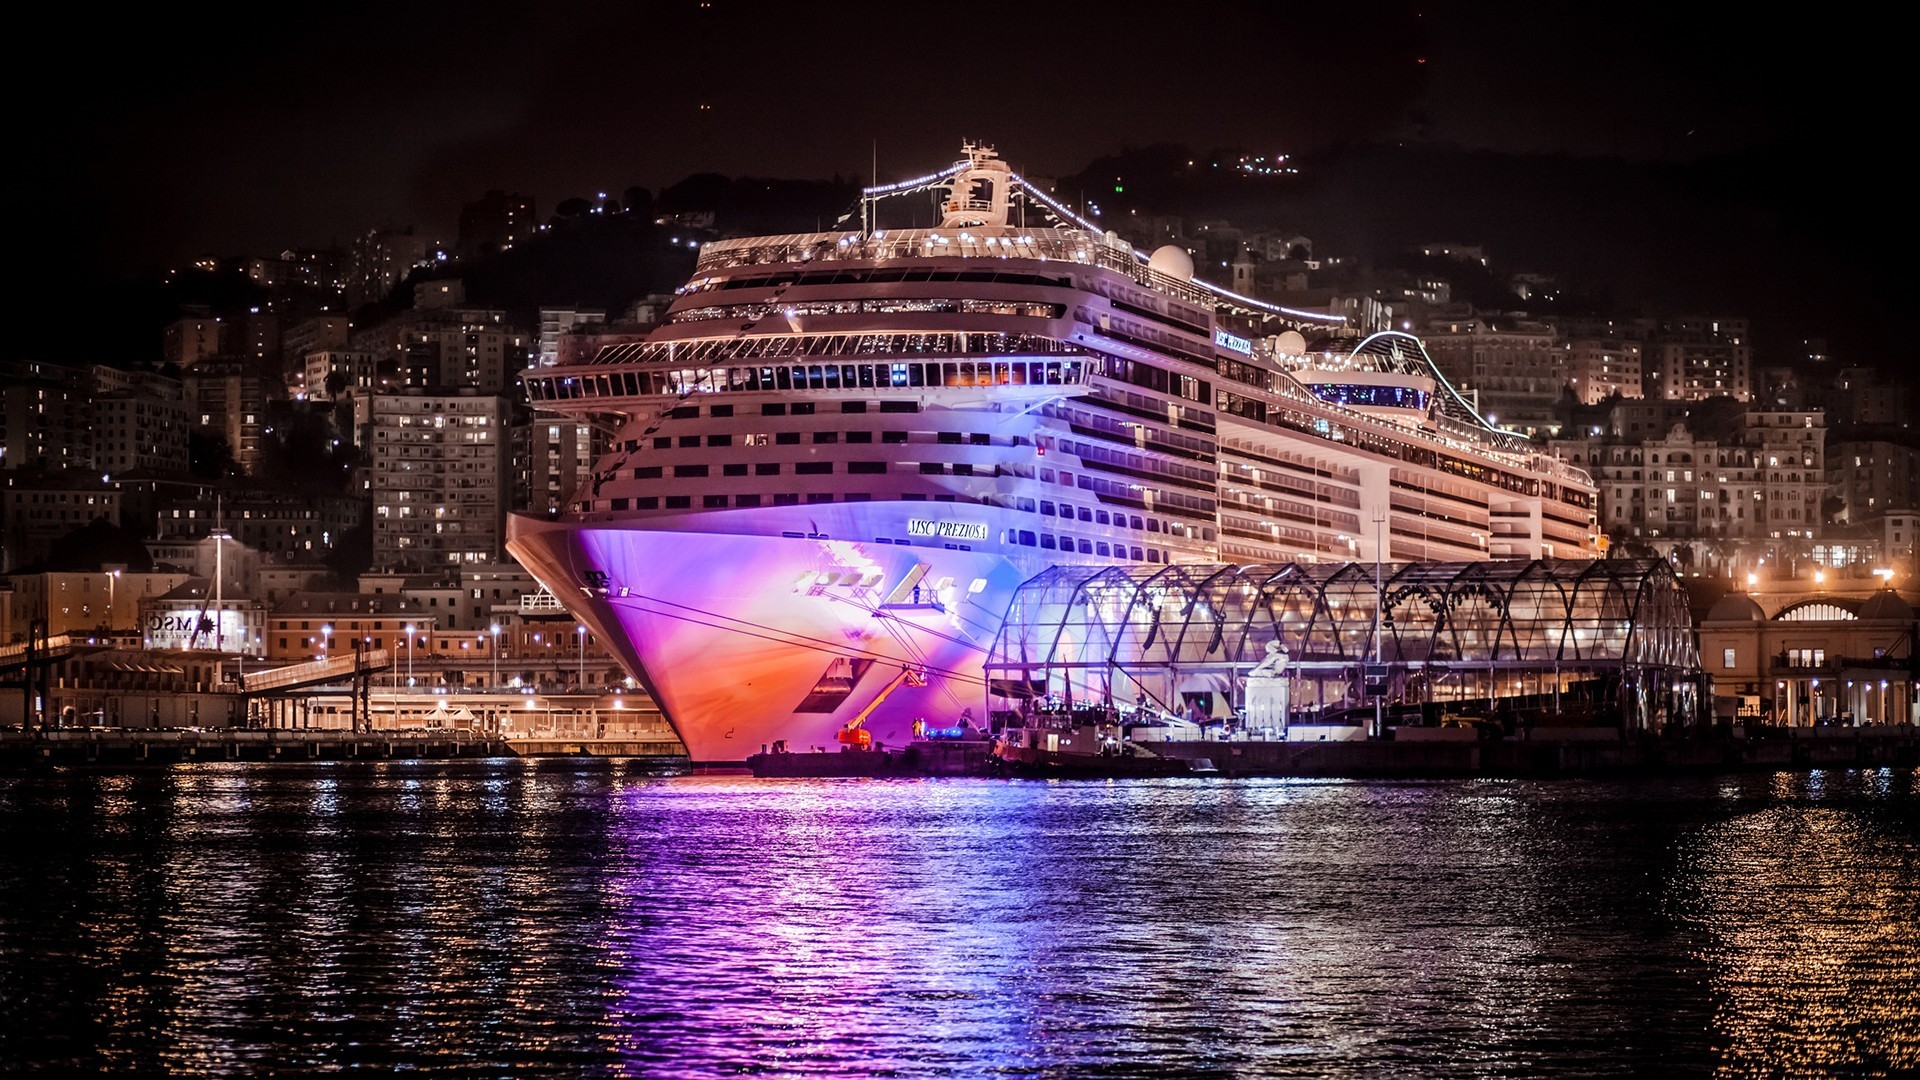 A Massive Cruise Ship Docked At Night HD Desktop Background wallpaper free